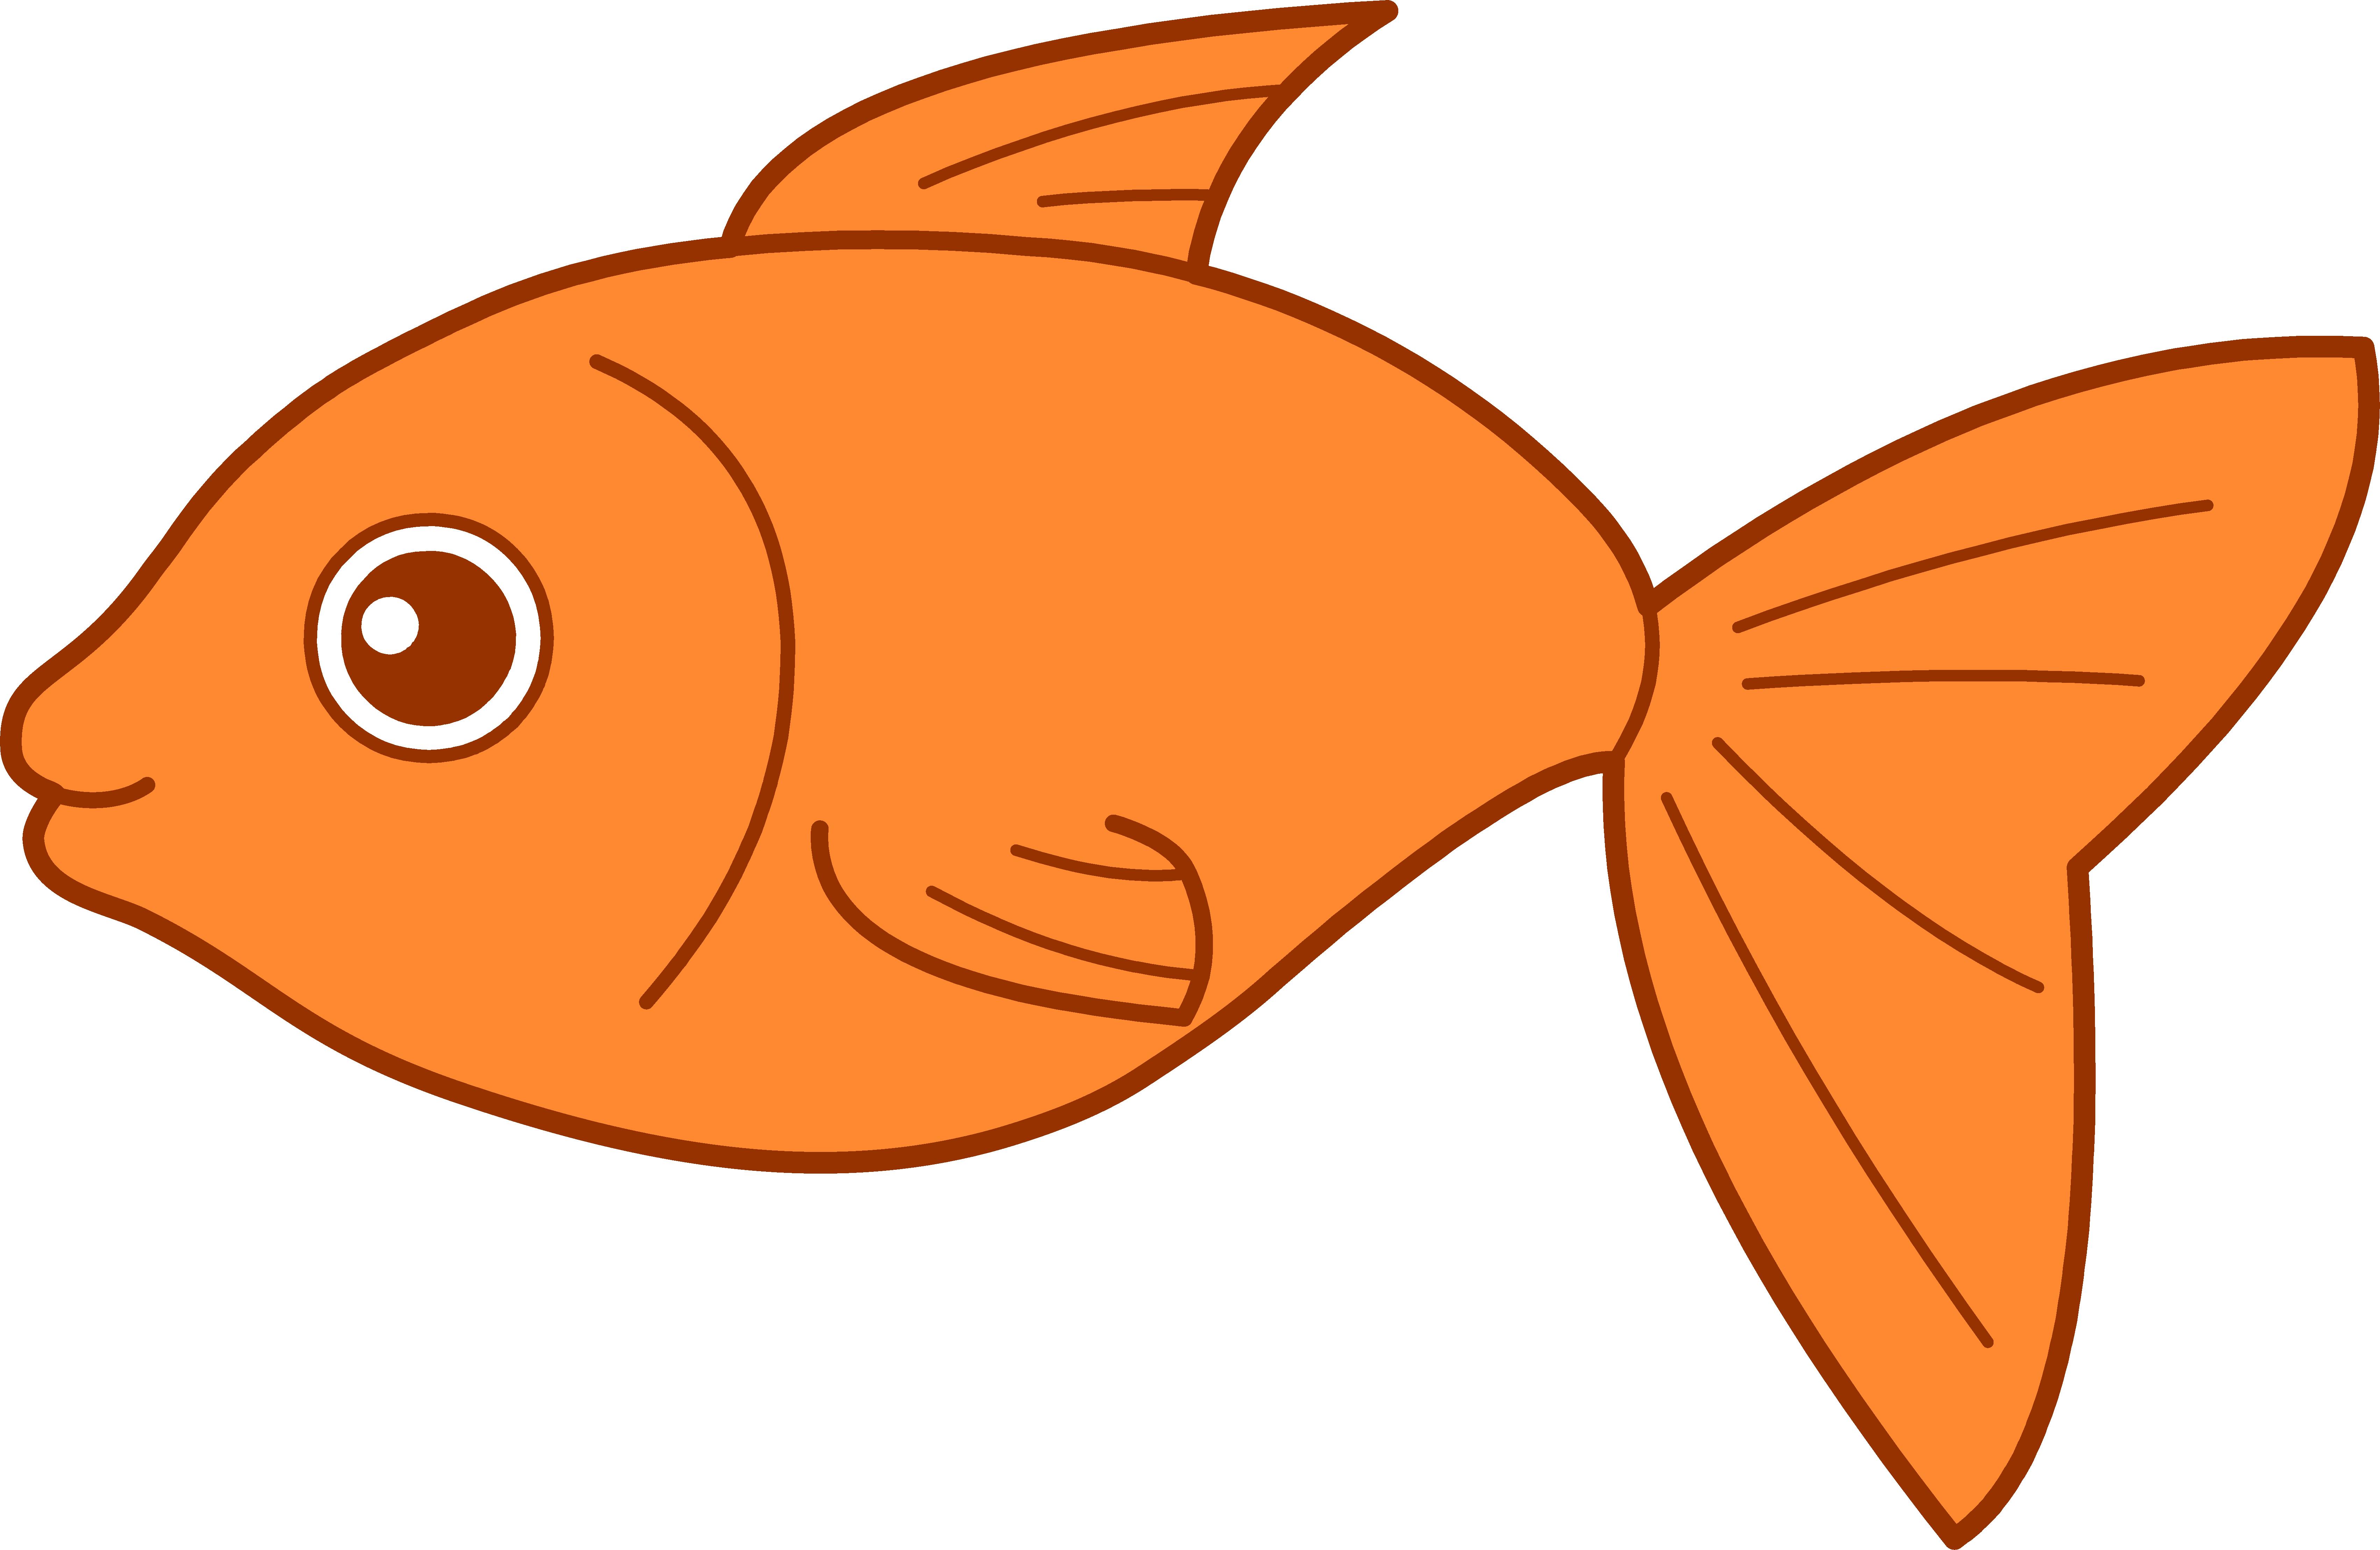 Ocean Animals Clipart - Cliparts.co